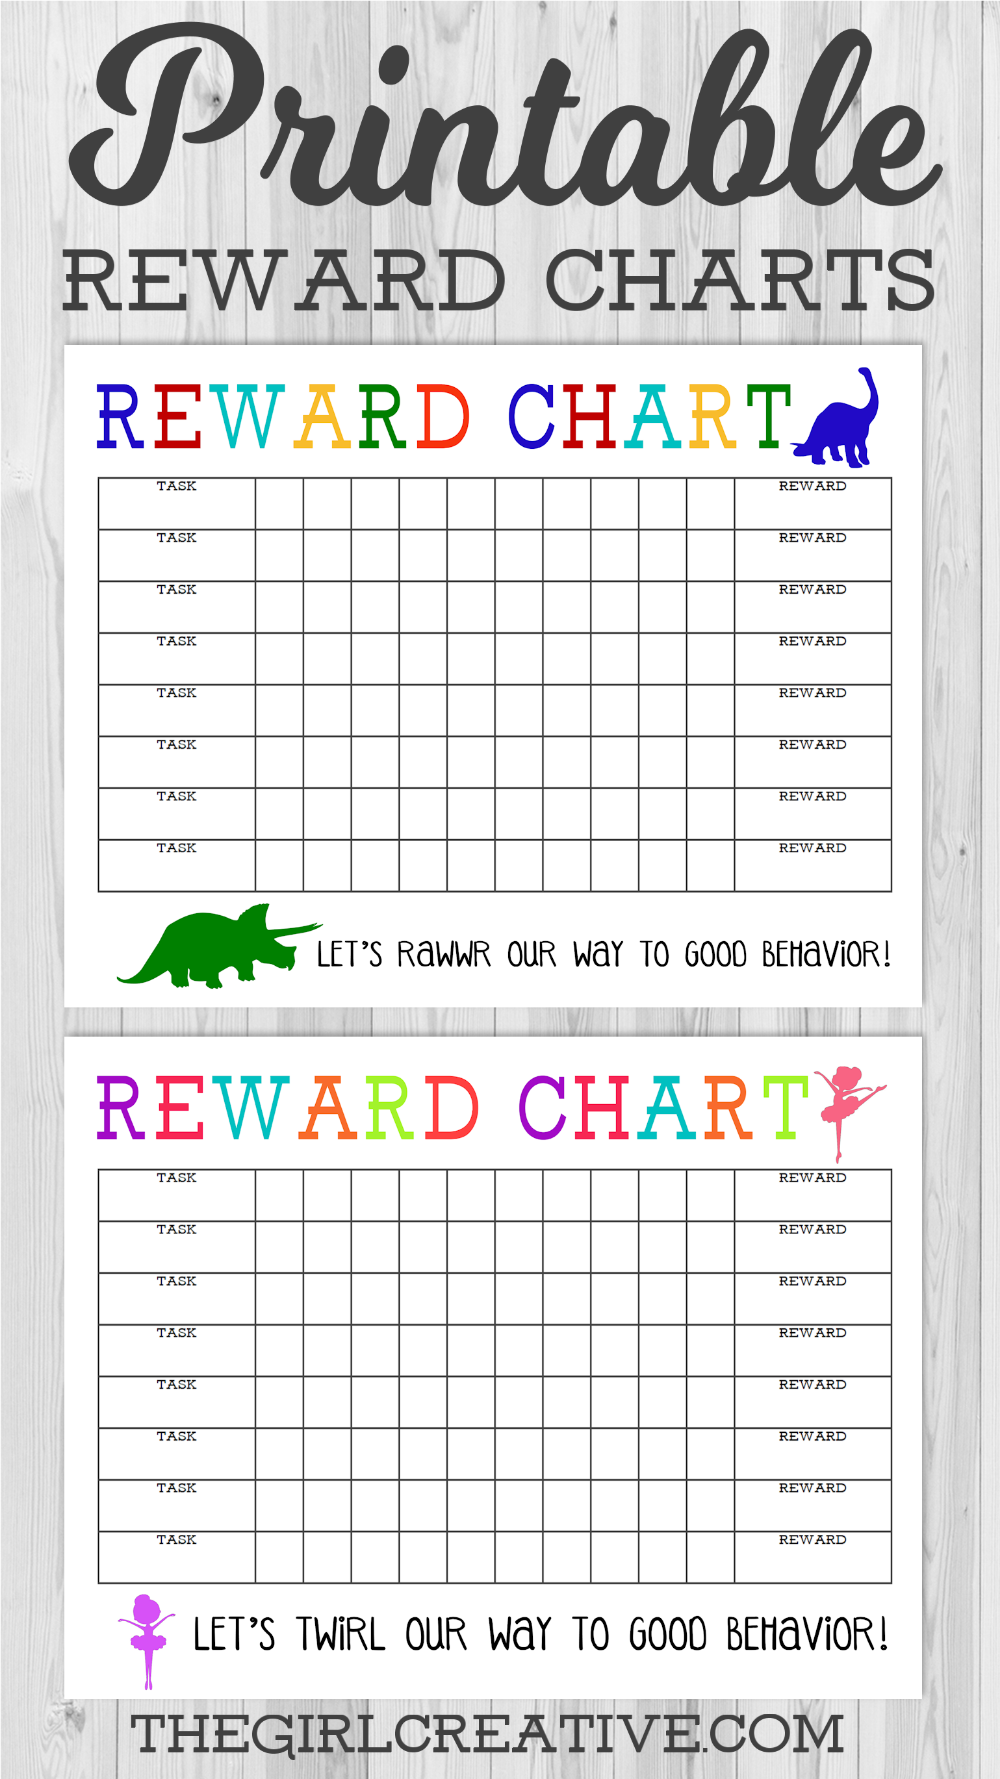 Photo of Printable Reward Chart